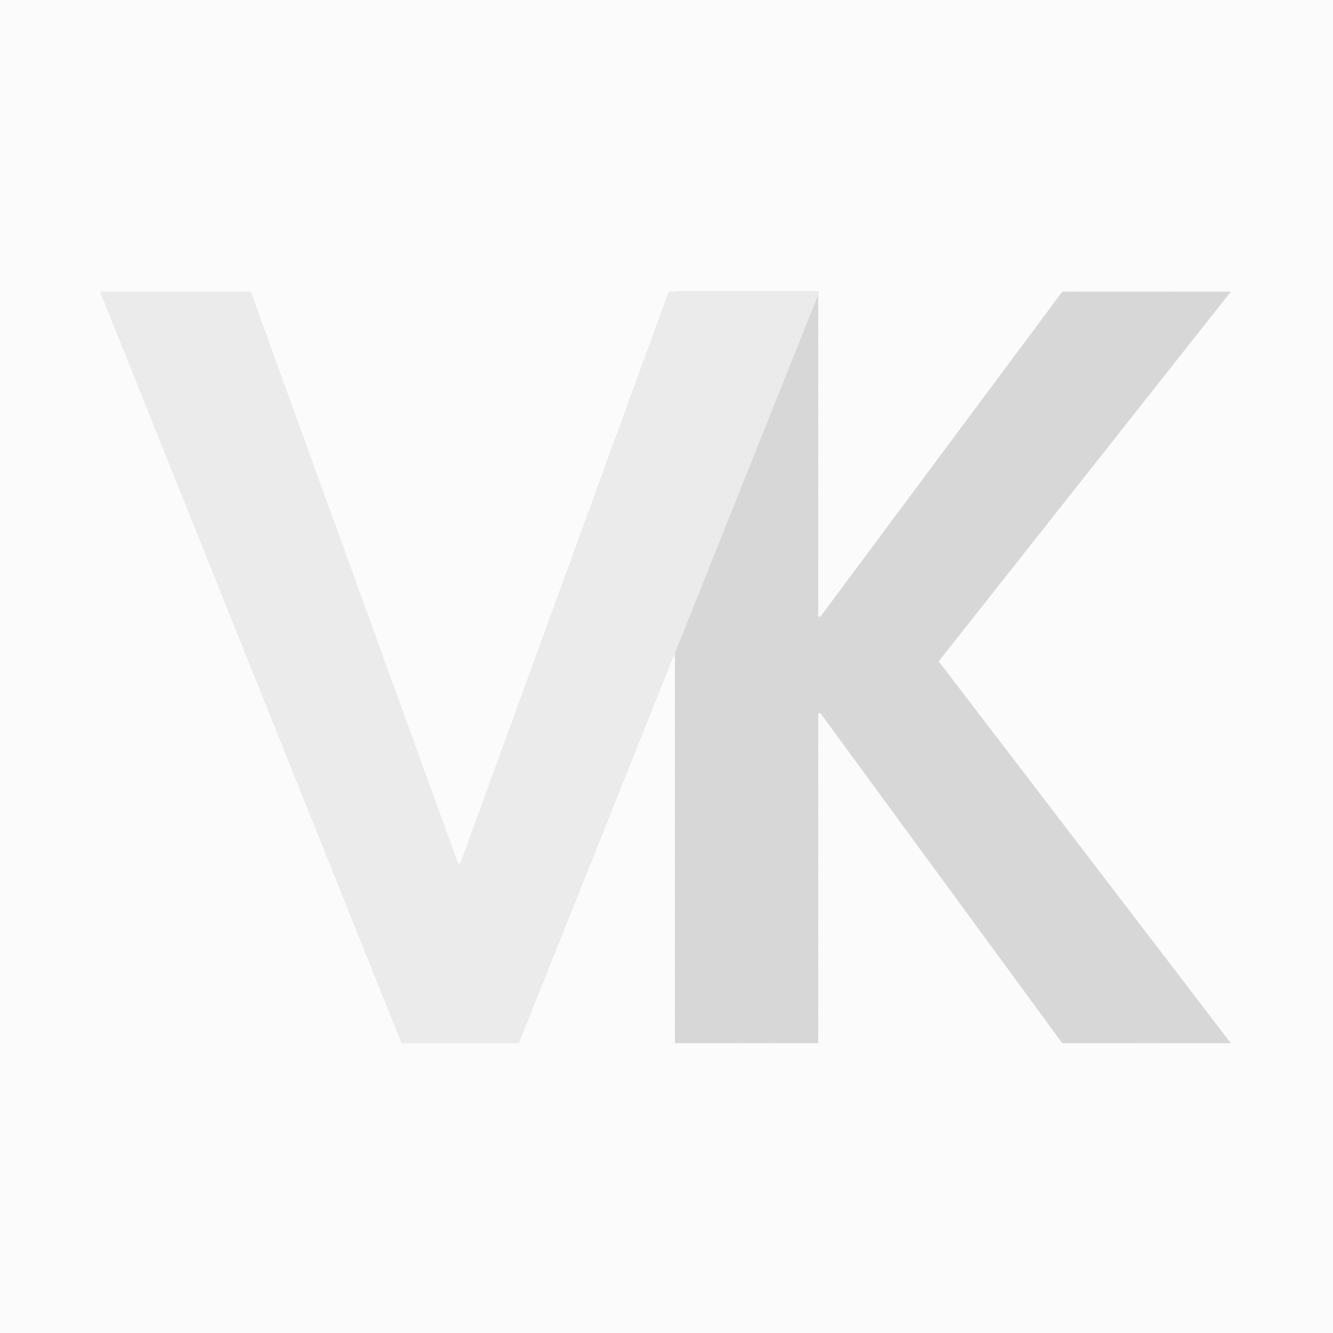 Wahl Opzetkamset Gekleurd Kliksysteem 8st. 3 t/m 25mm